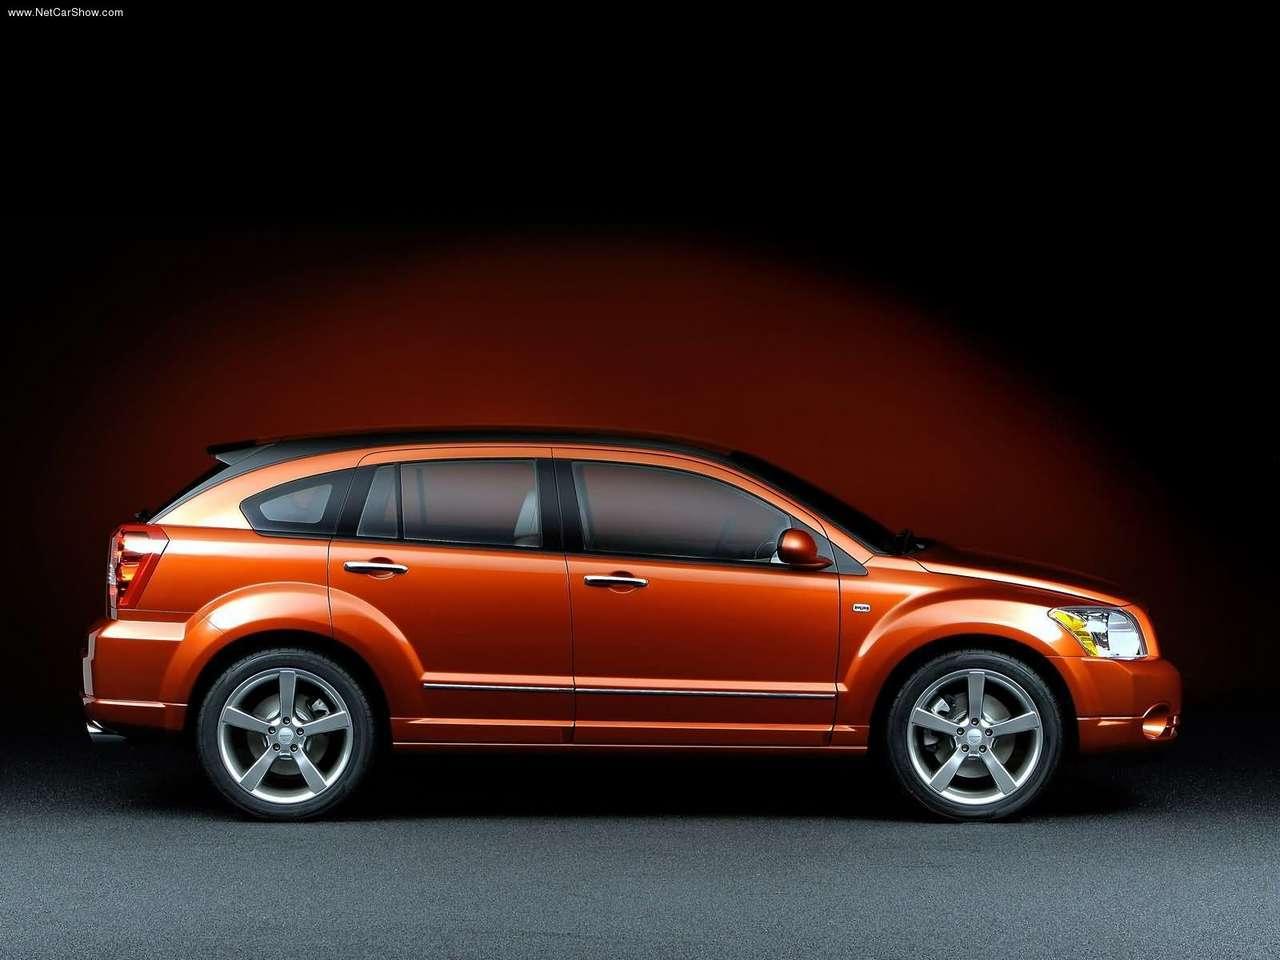 2005 Dodge Caliber Concept